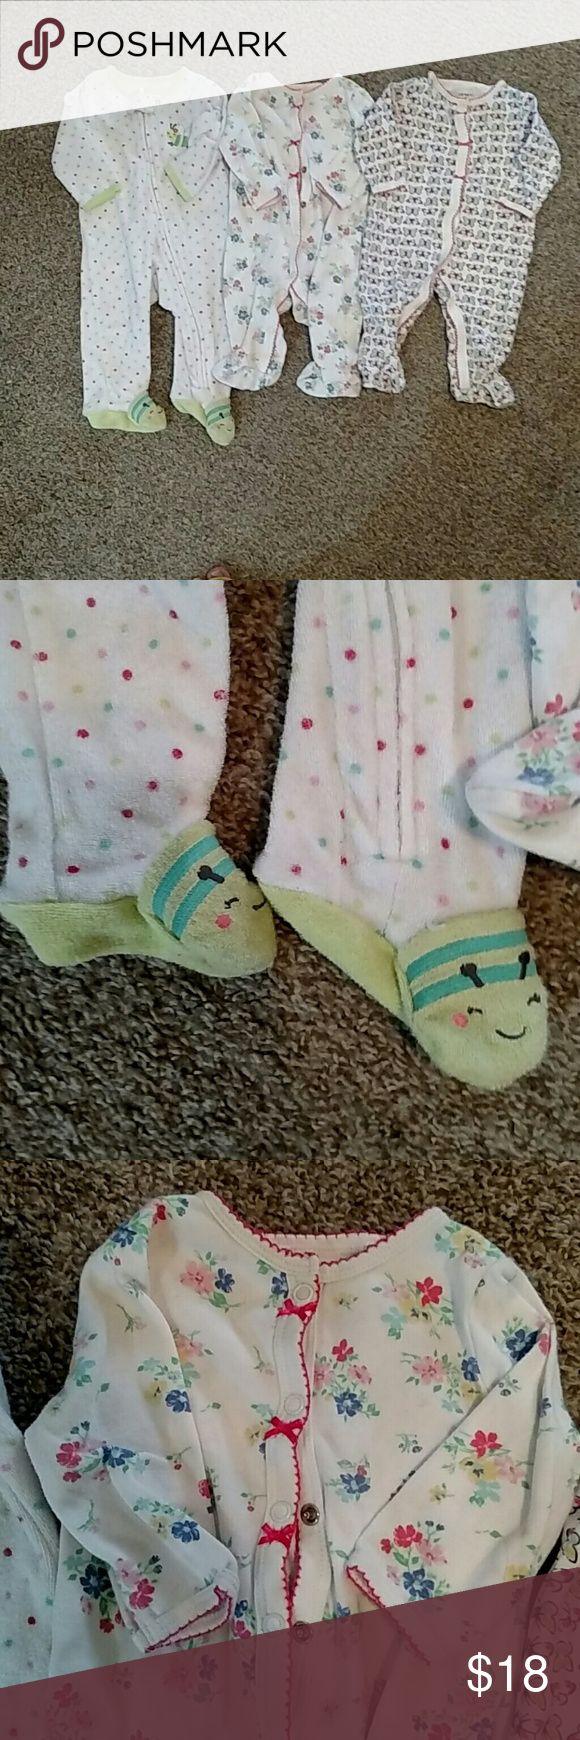 NWOT: Carter's baby girl bundle 0-3 months Baby girl bundle of 3 Carter's sleepers 0-3 months Carter's Matching Sets